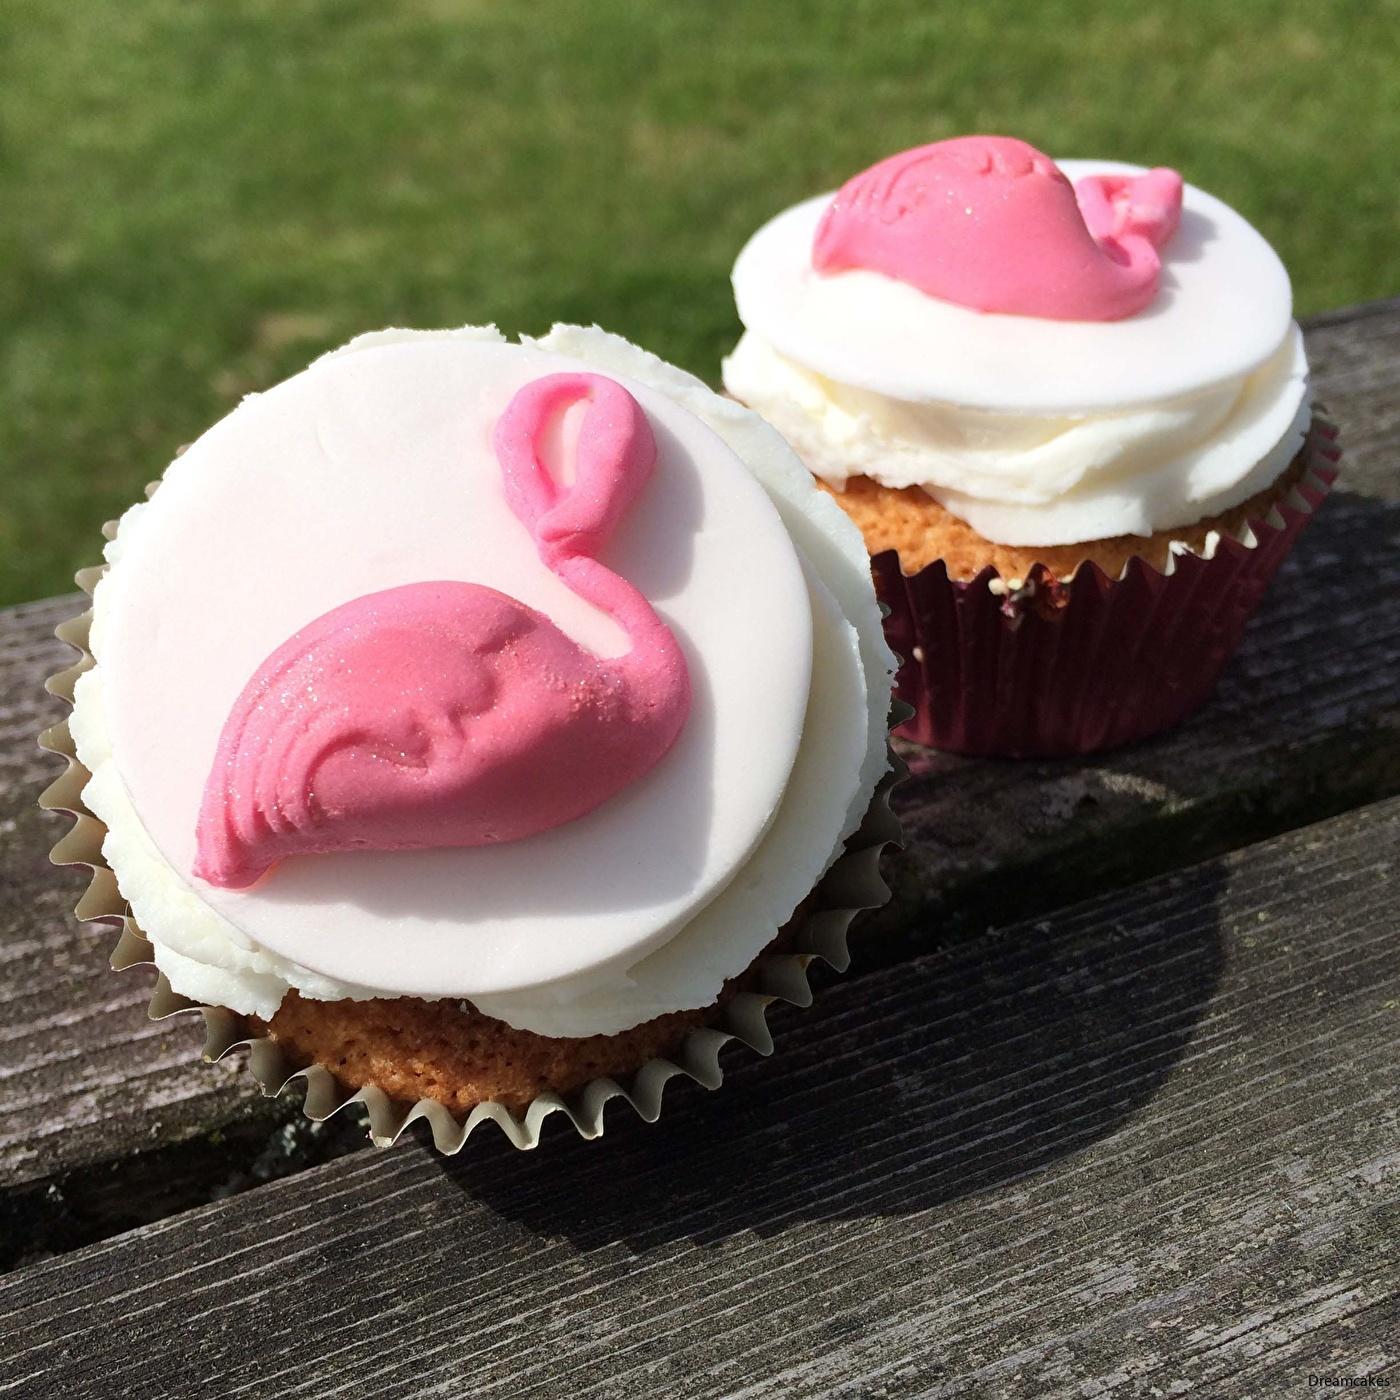 flamingo, tårtdekoration flamingo, flamingocupcakes, flamingois, is som flamingo, isform flamingo